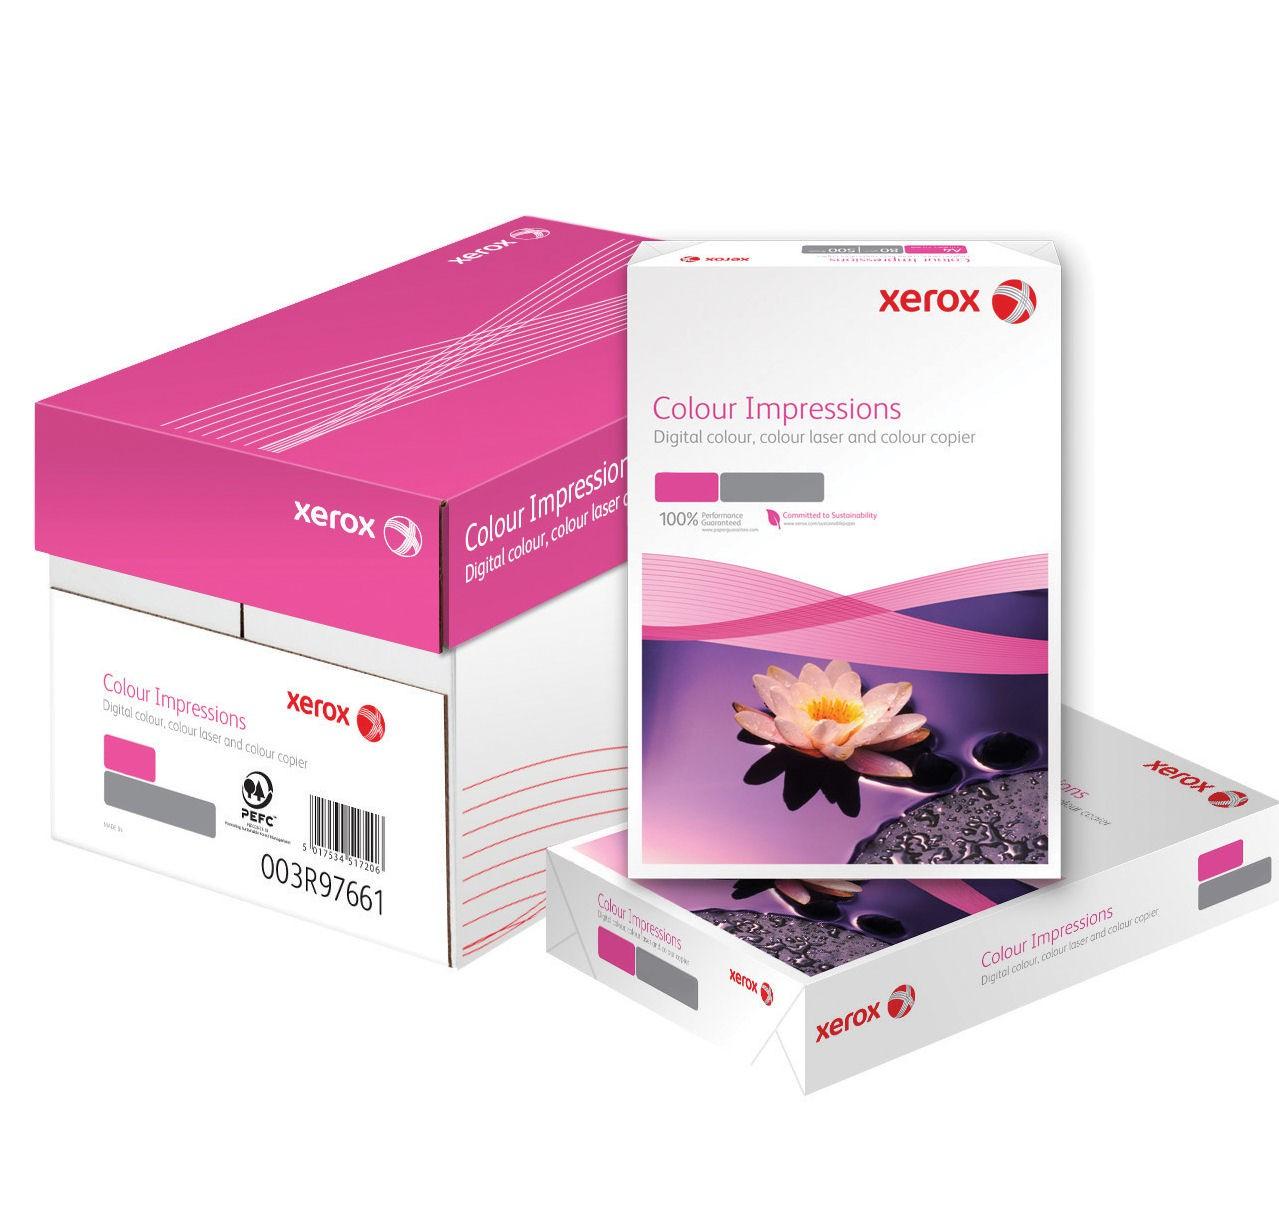 Xerox Colour Impressions A3 420X297mm PEFC 90Gm2 SG Pack 500 003R97664